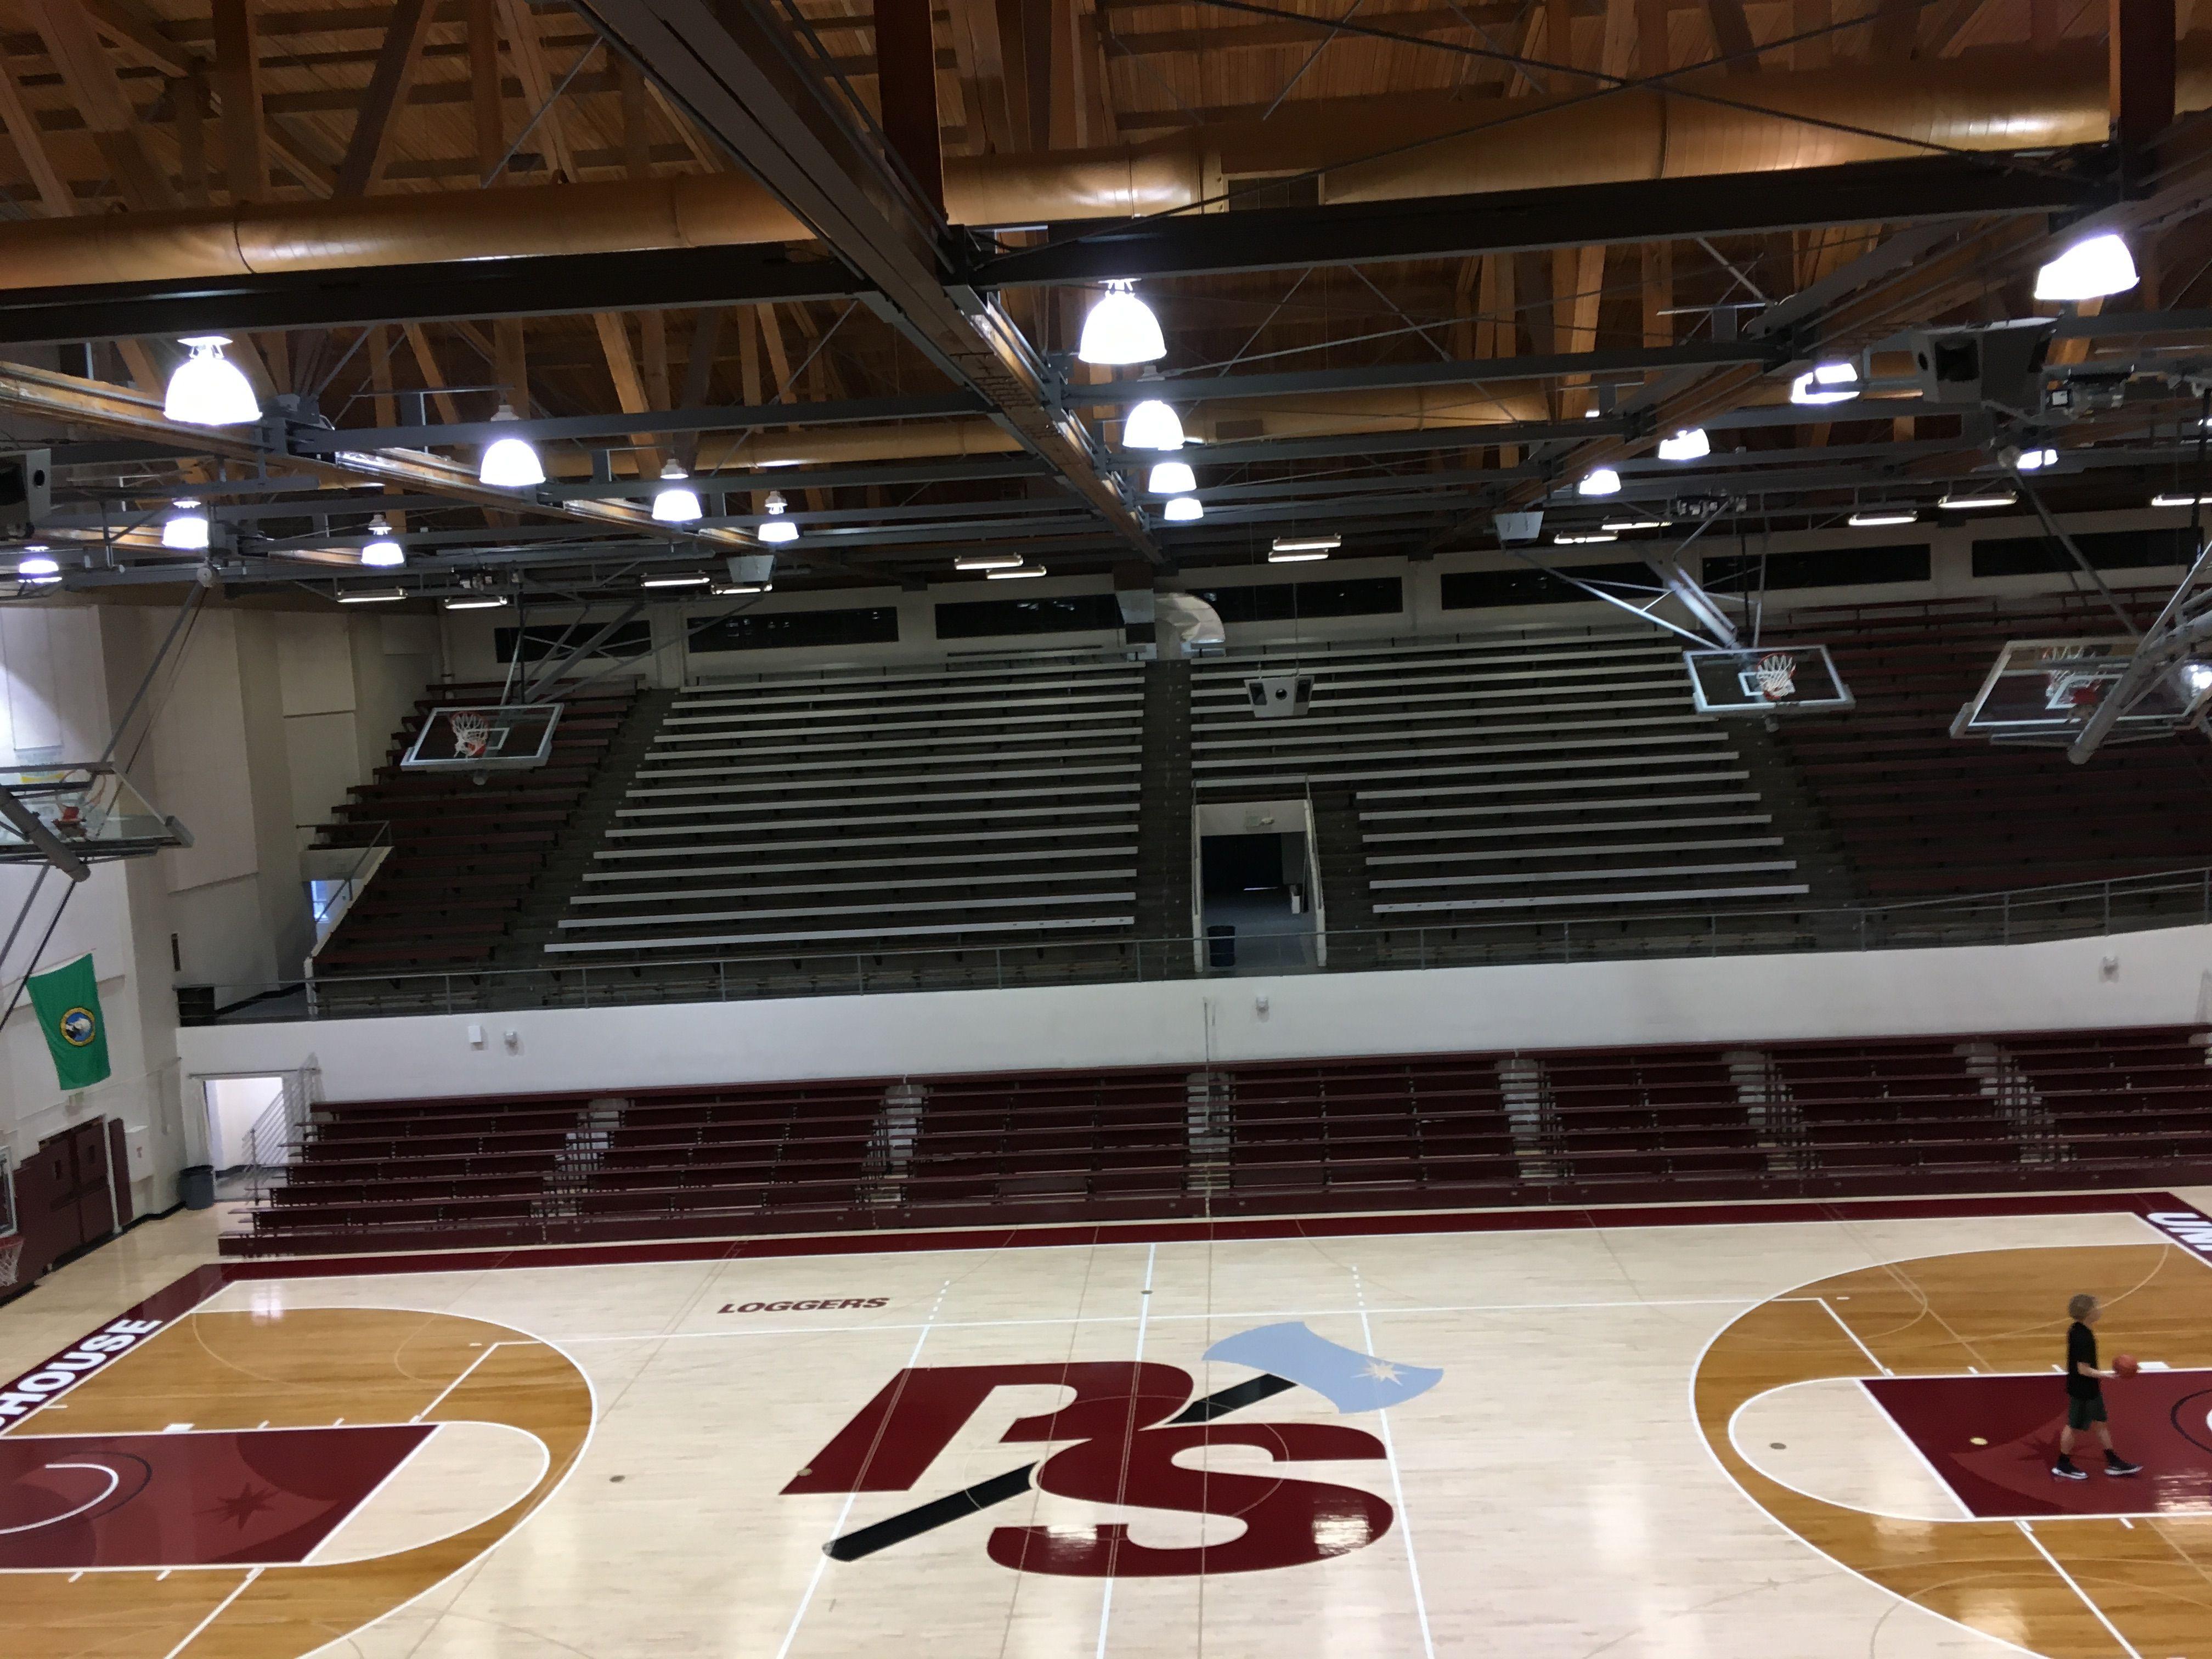 Memorial Fieldhouse University Of Puget Sound Tacoma Washington Sports Puget Puget Sound